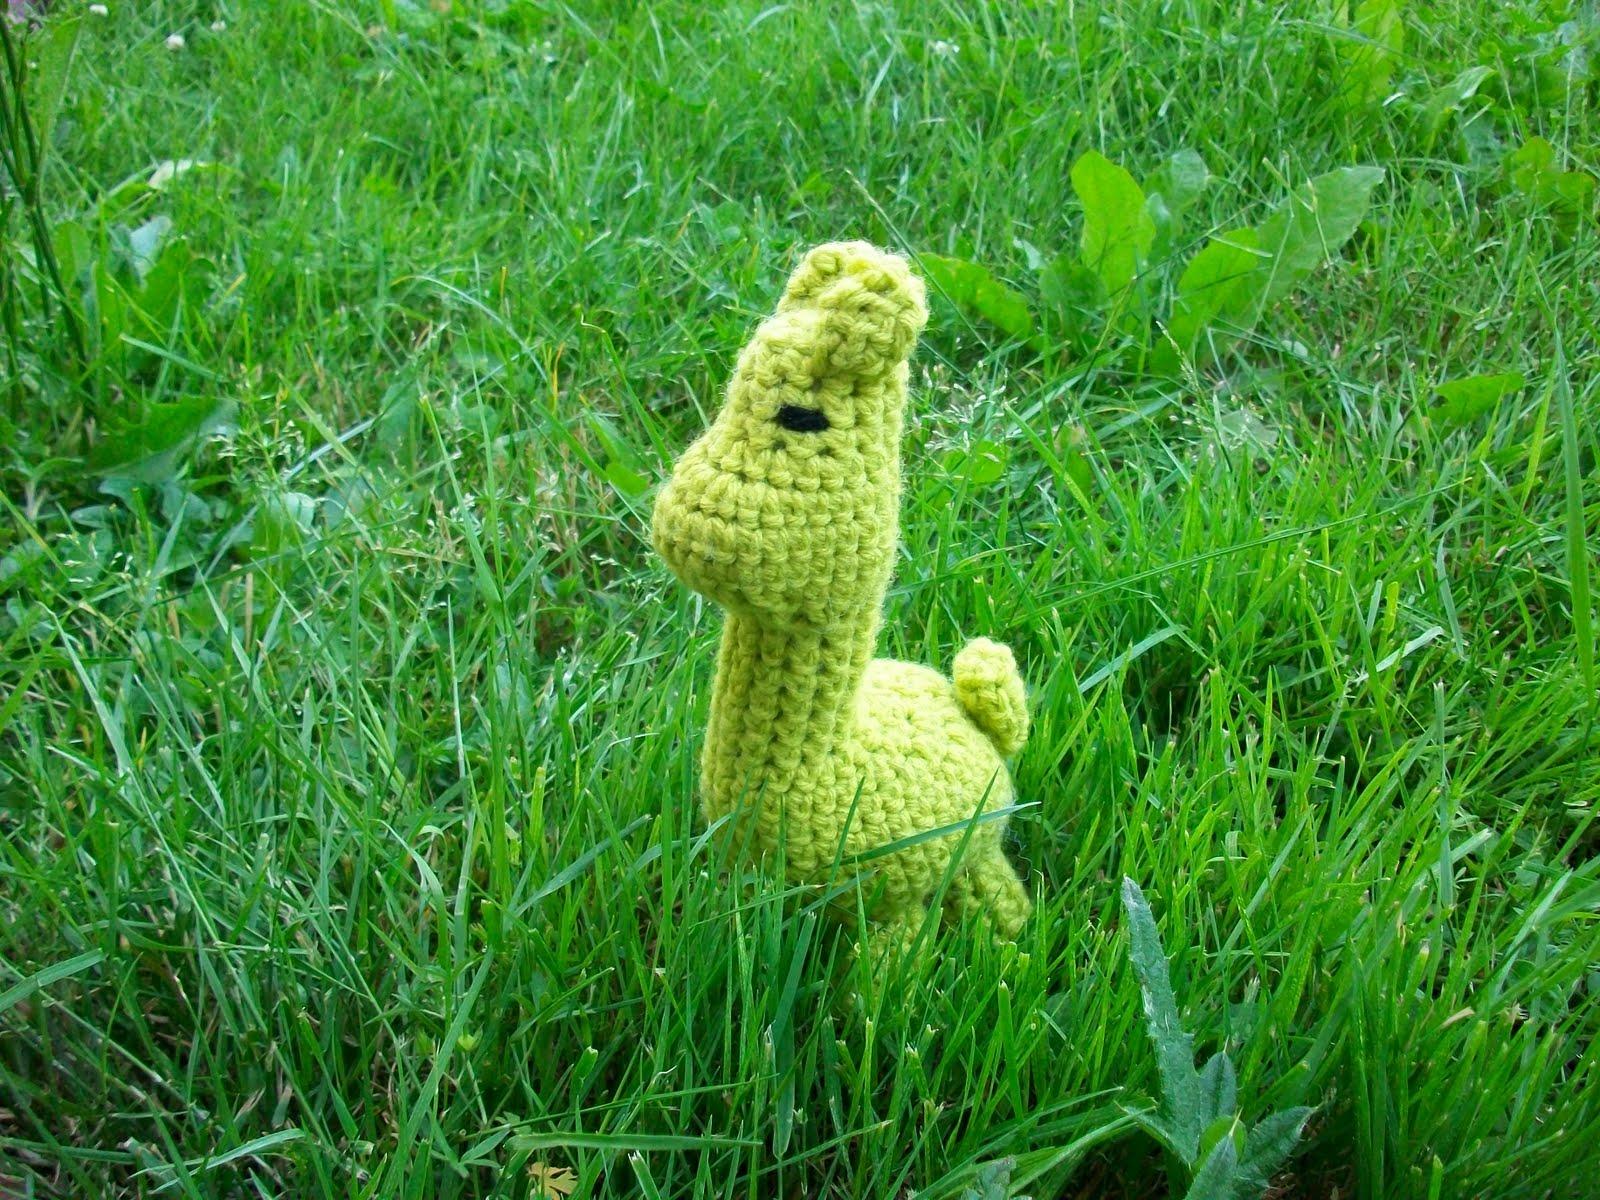 Amigurumi Llama Free Pattern : JenniCreates: Crochet Llama pattern!